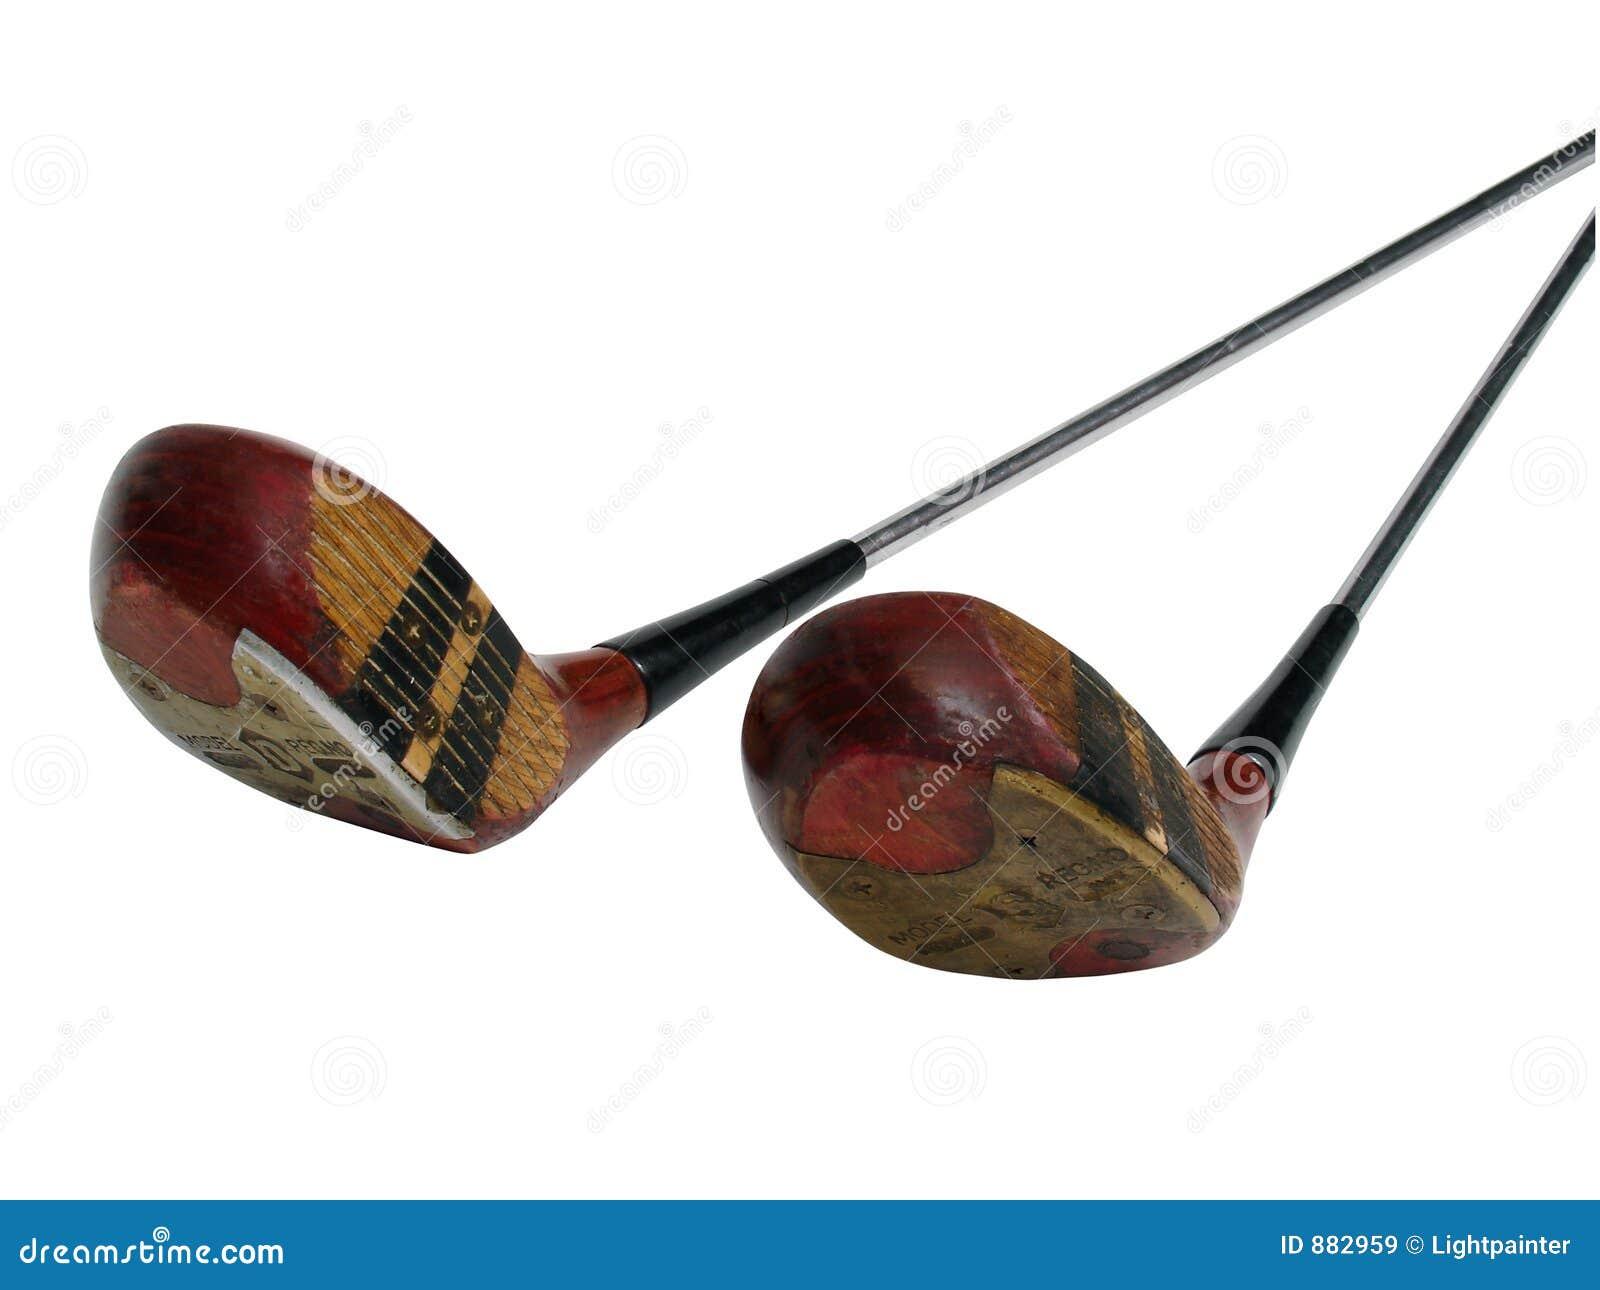 3 golf